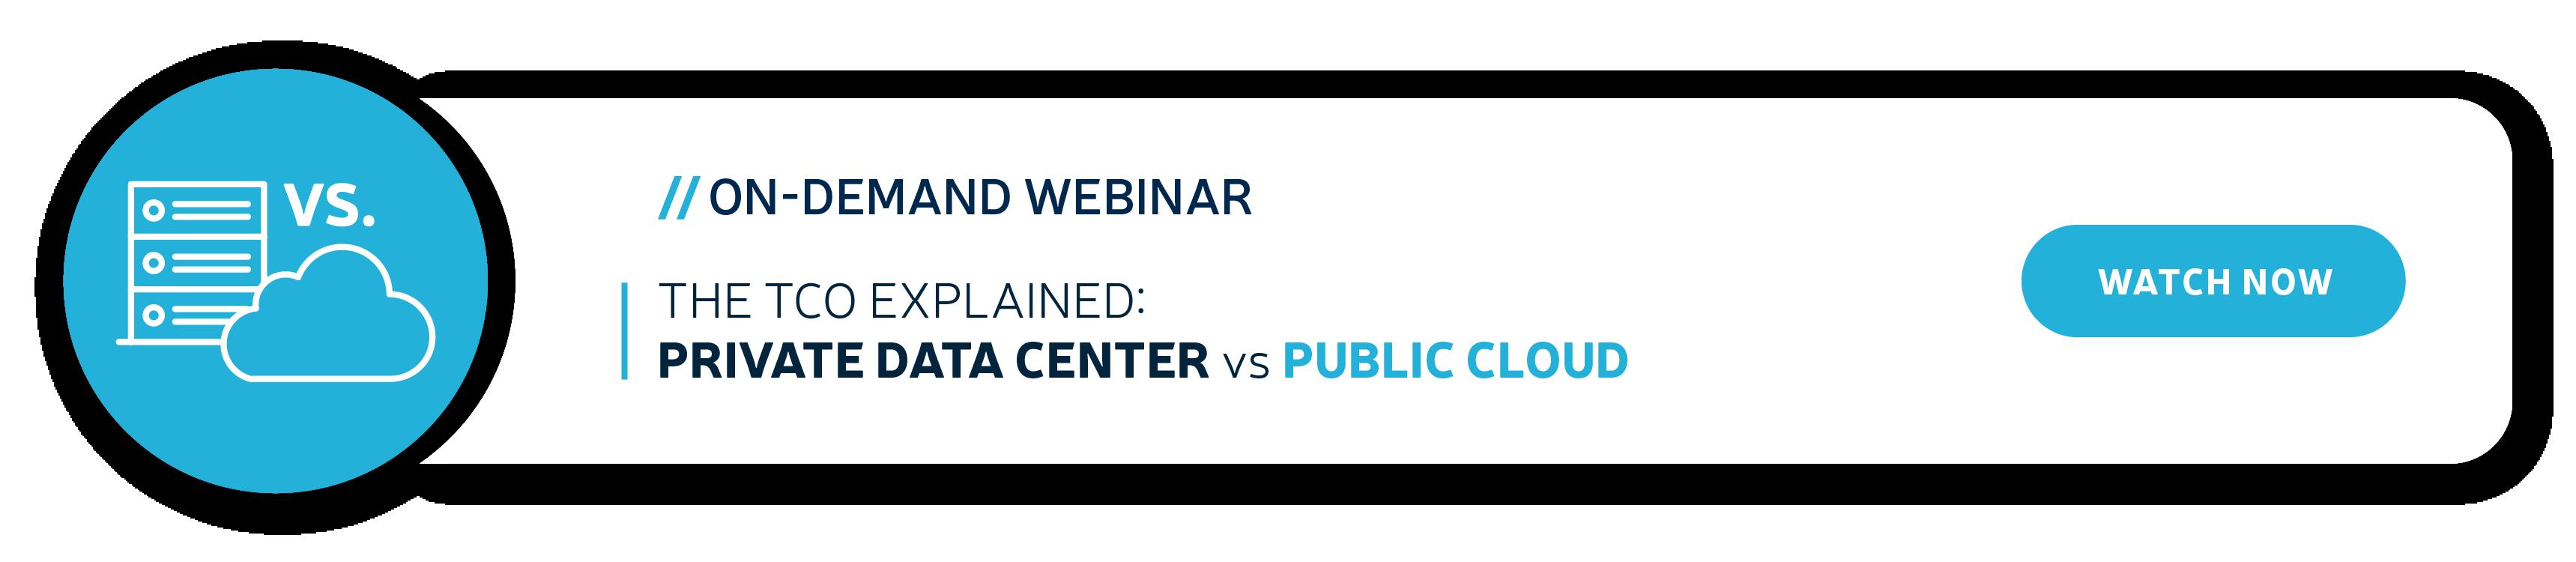 blog-banner-on_demand-webinar-private-data-center-vs-public-cloud